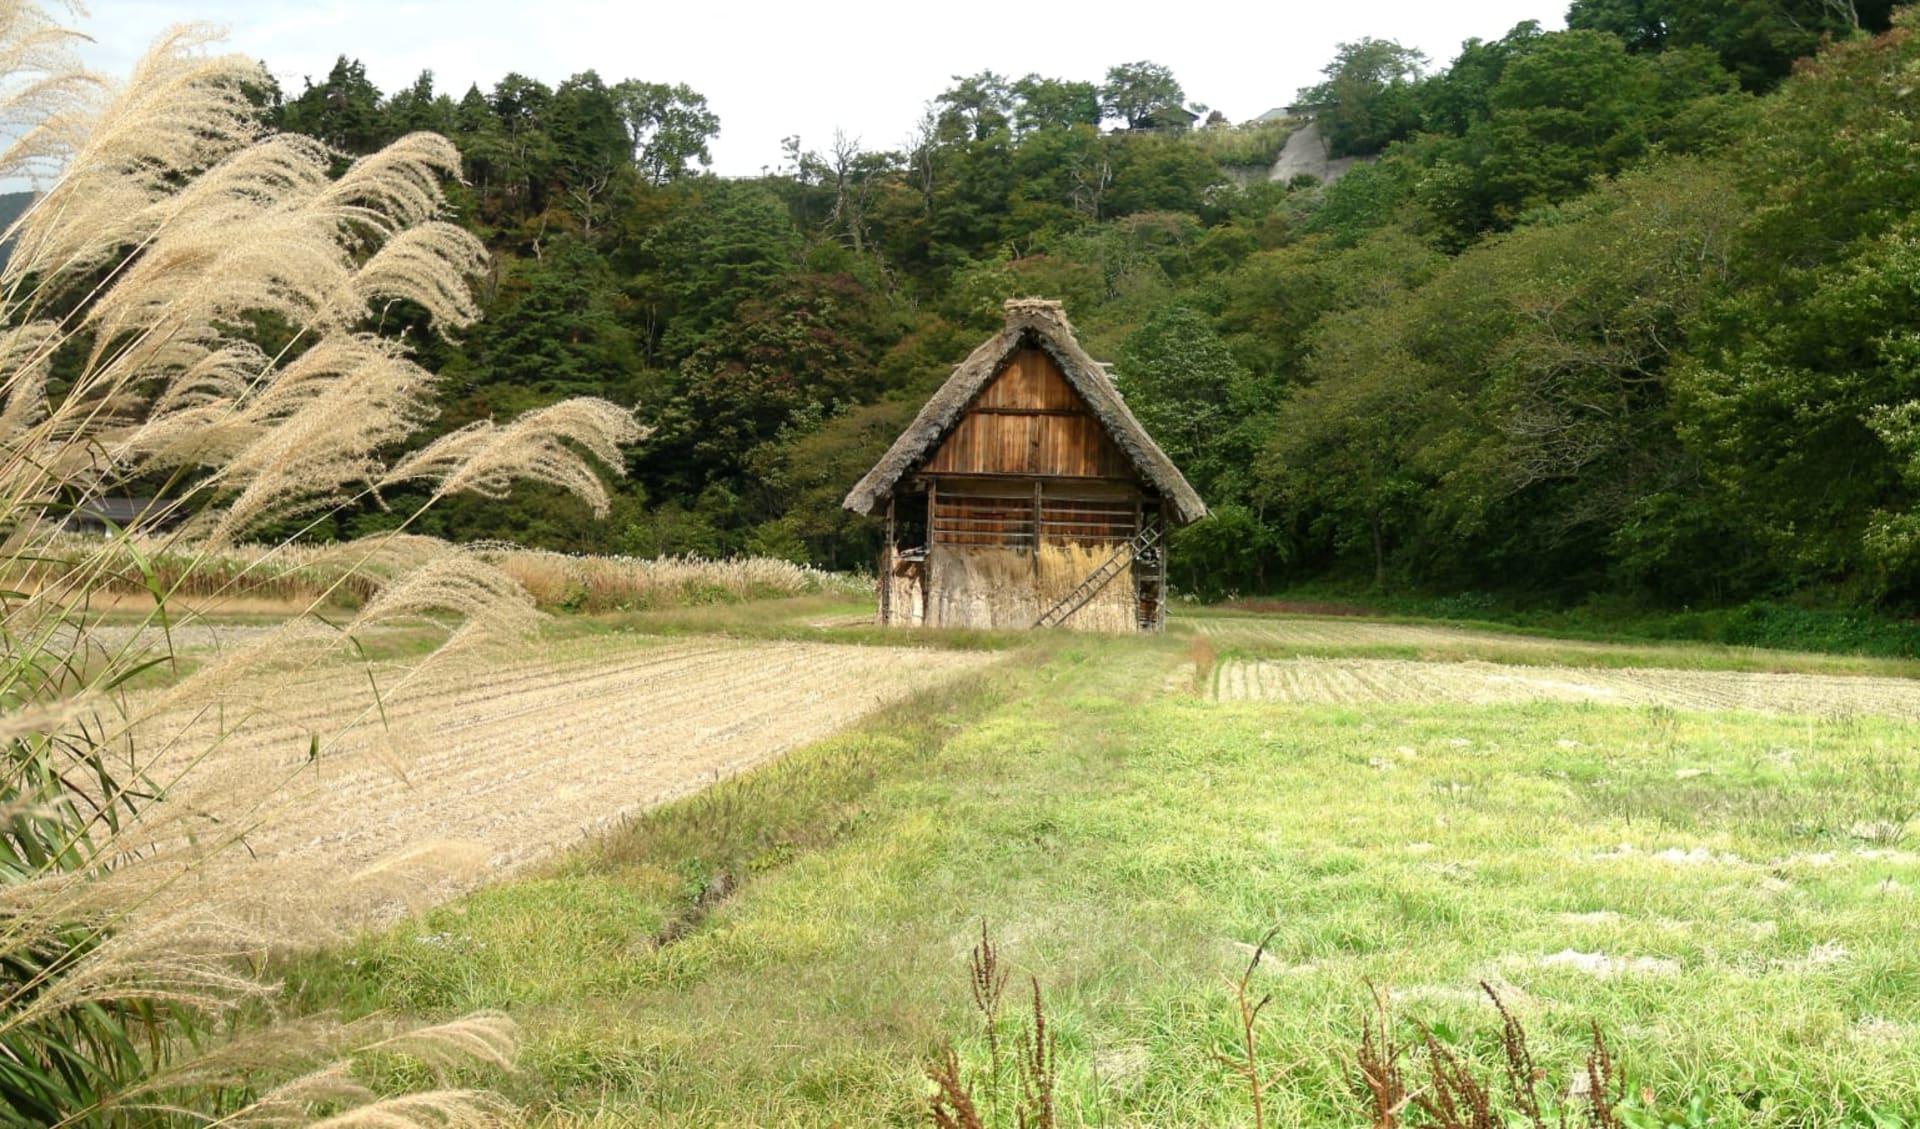 Gruppenreise «Glanzlichter Japans» ab Tokio: Shirakawago